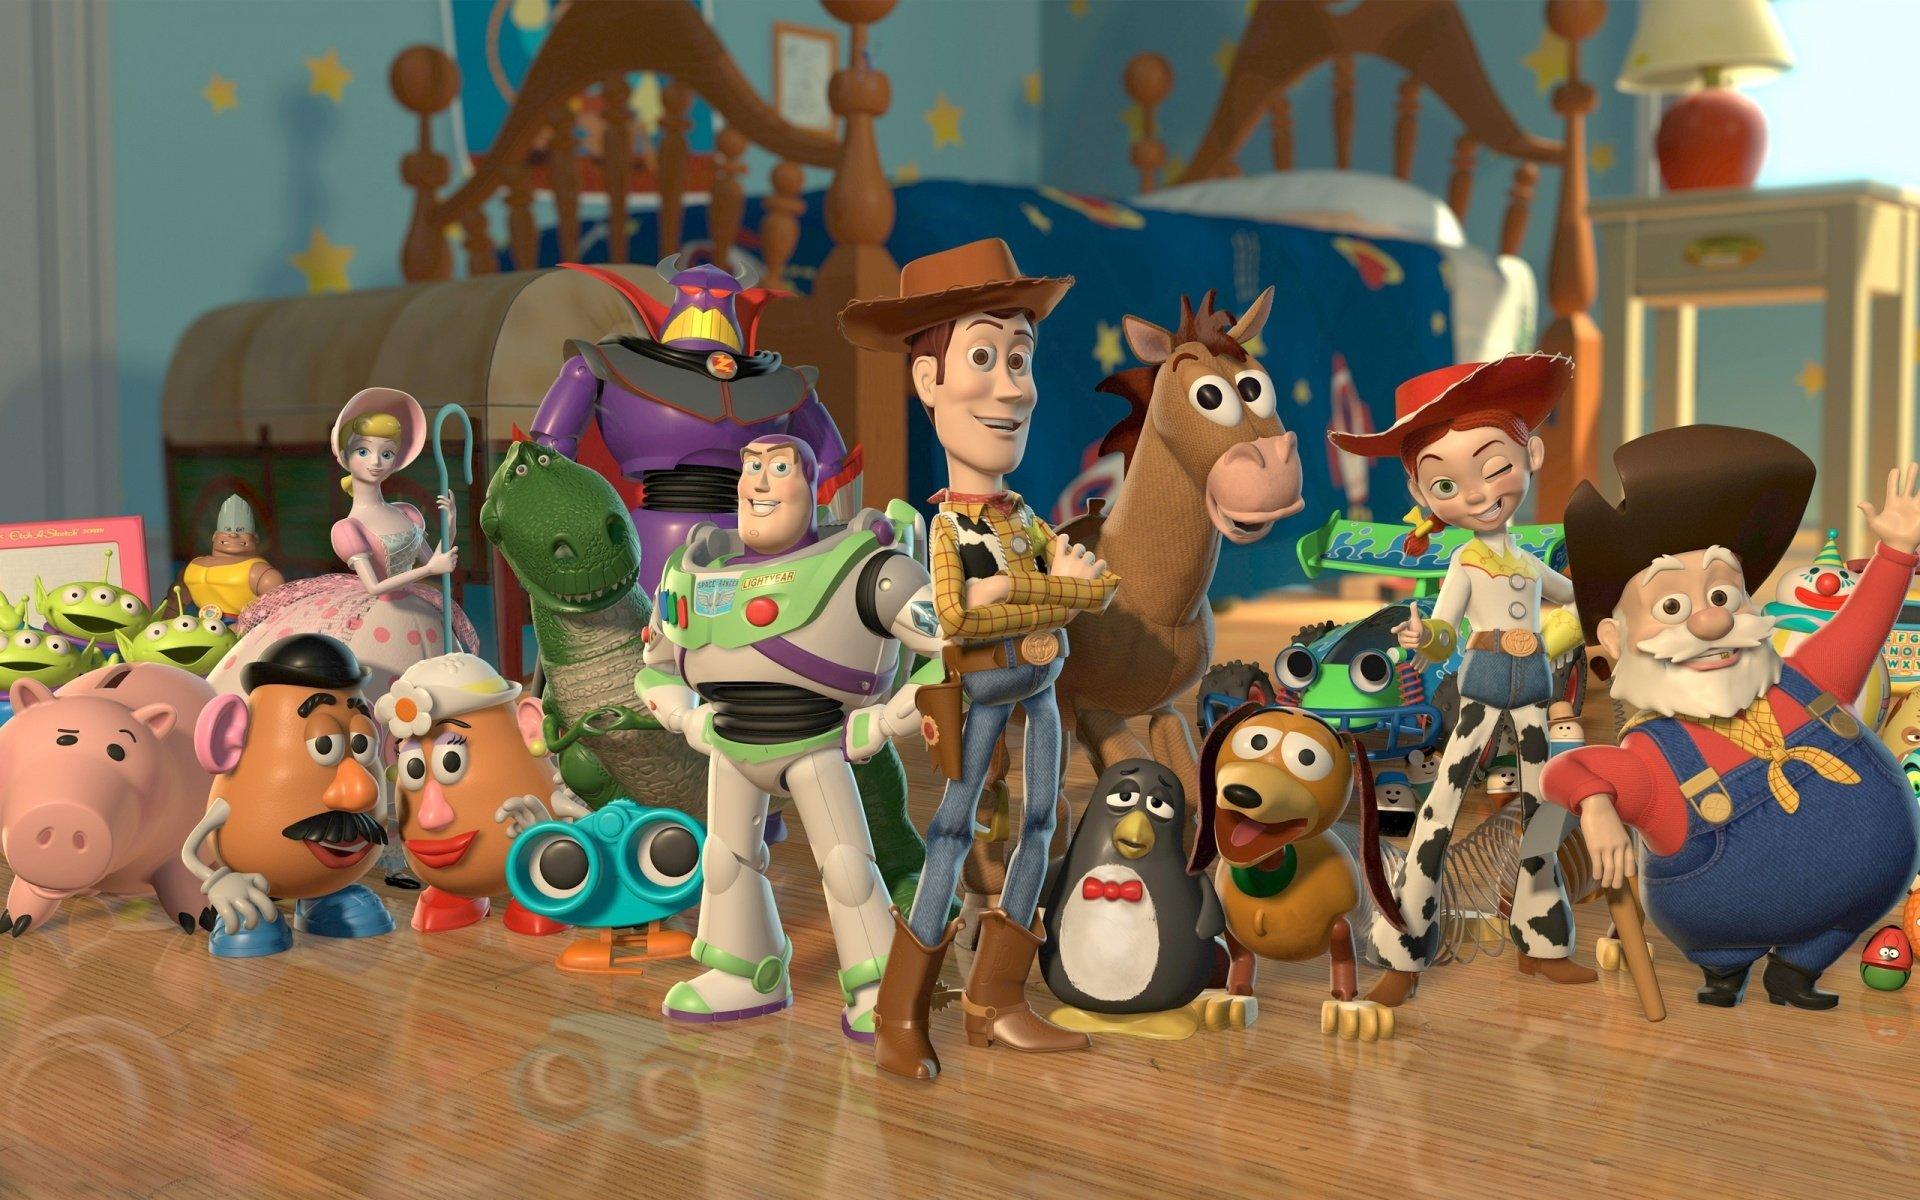 Toy Story Hd Wallpaper Hintergrund 1920x1200 Id210048